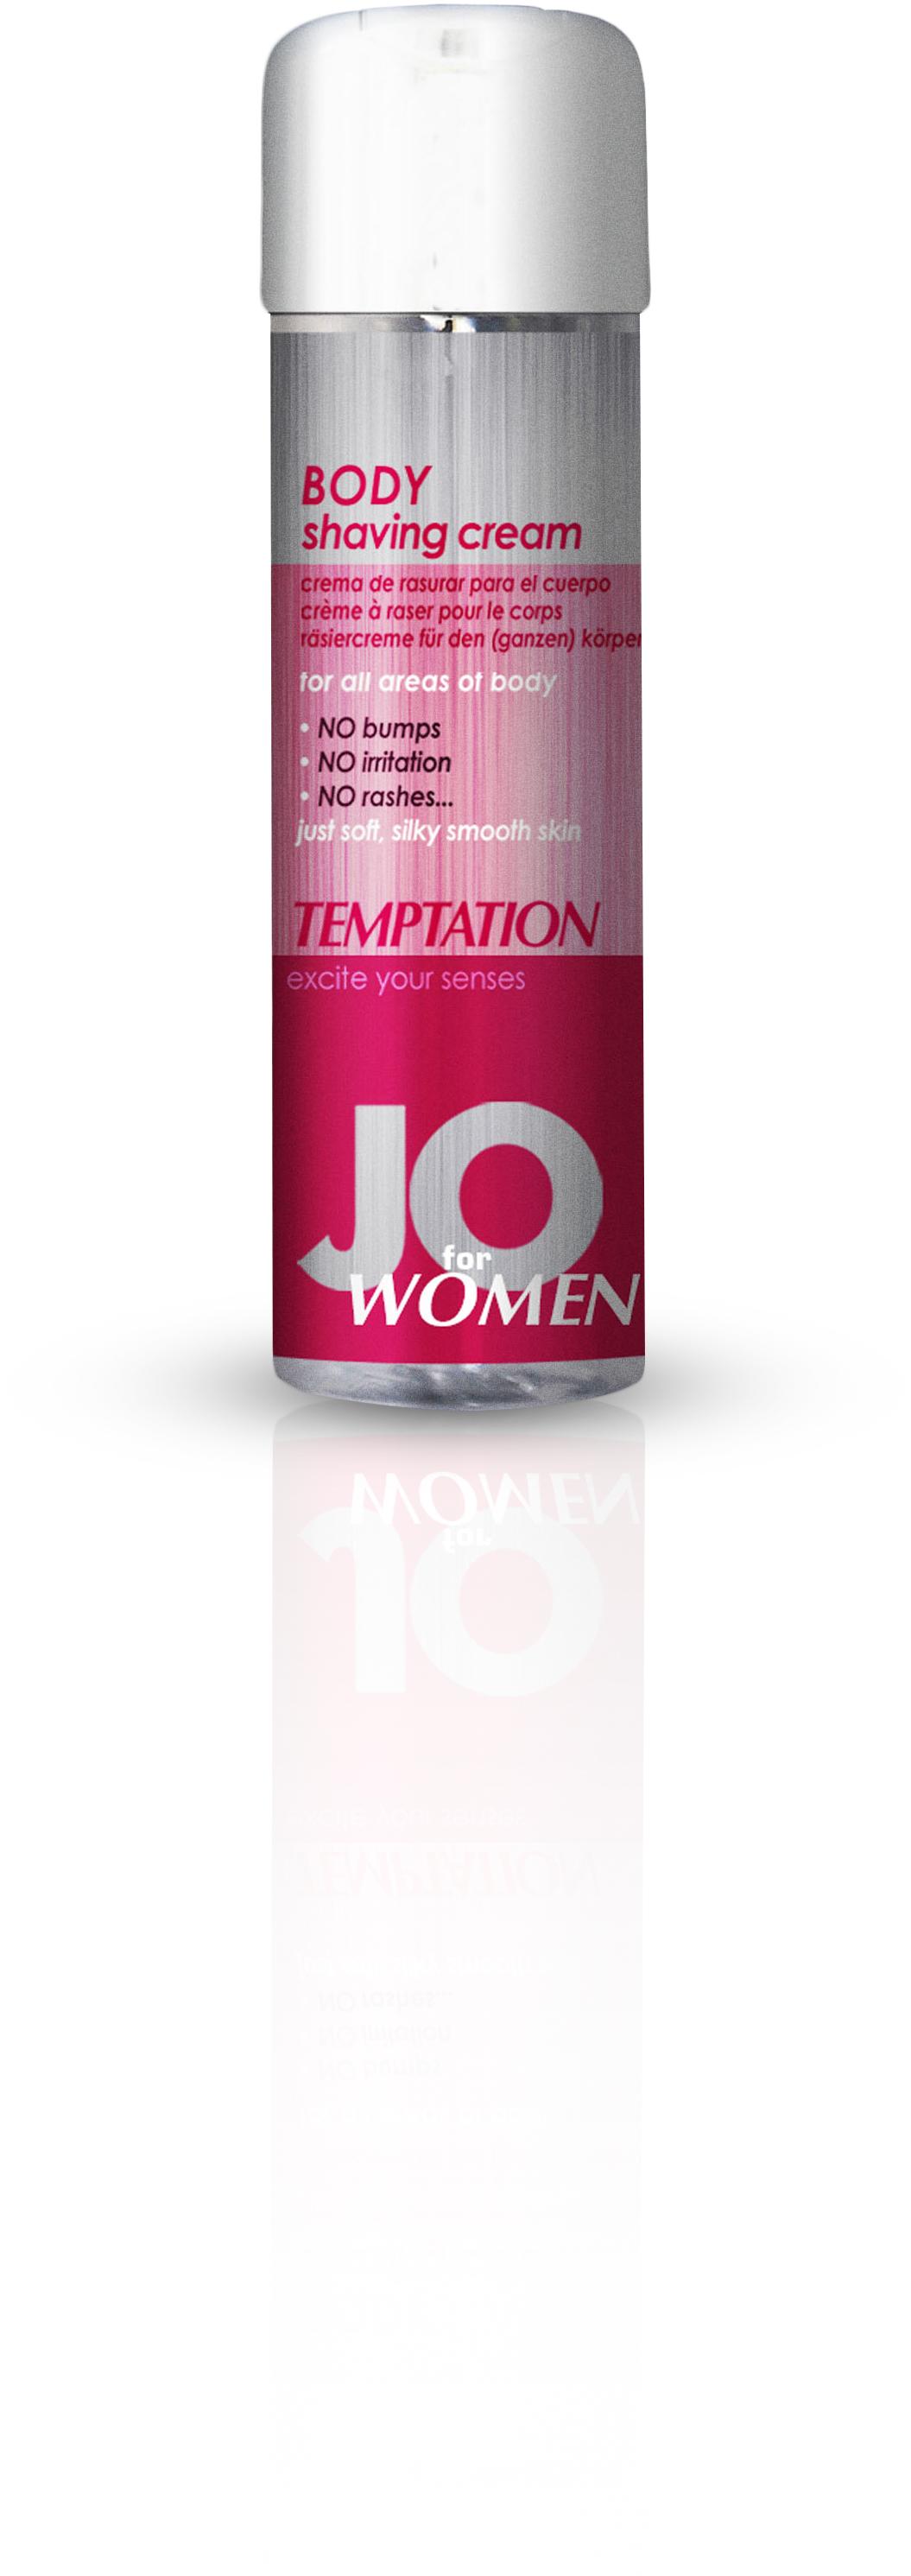 40182_JO_shavecream_women_temptation_8oz.jpg